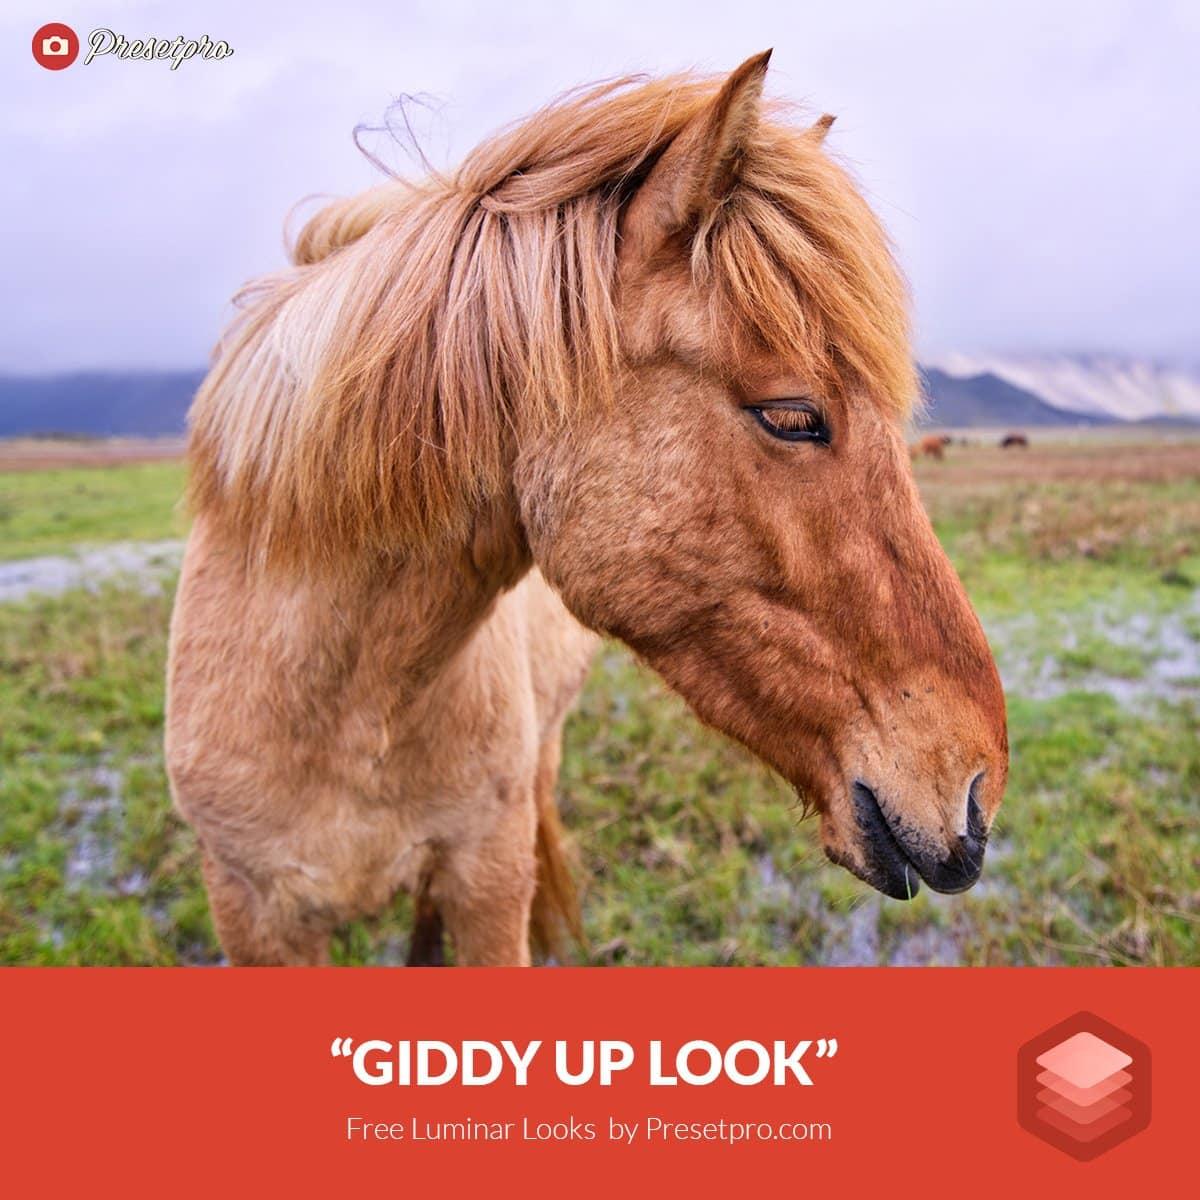 Free-Luminar-Look-Giddy-Up-Preset-Presetpro.com-